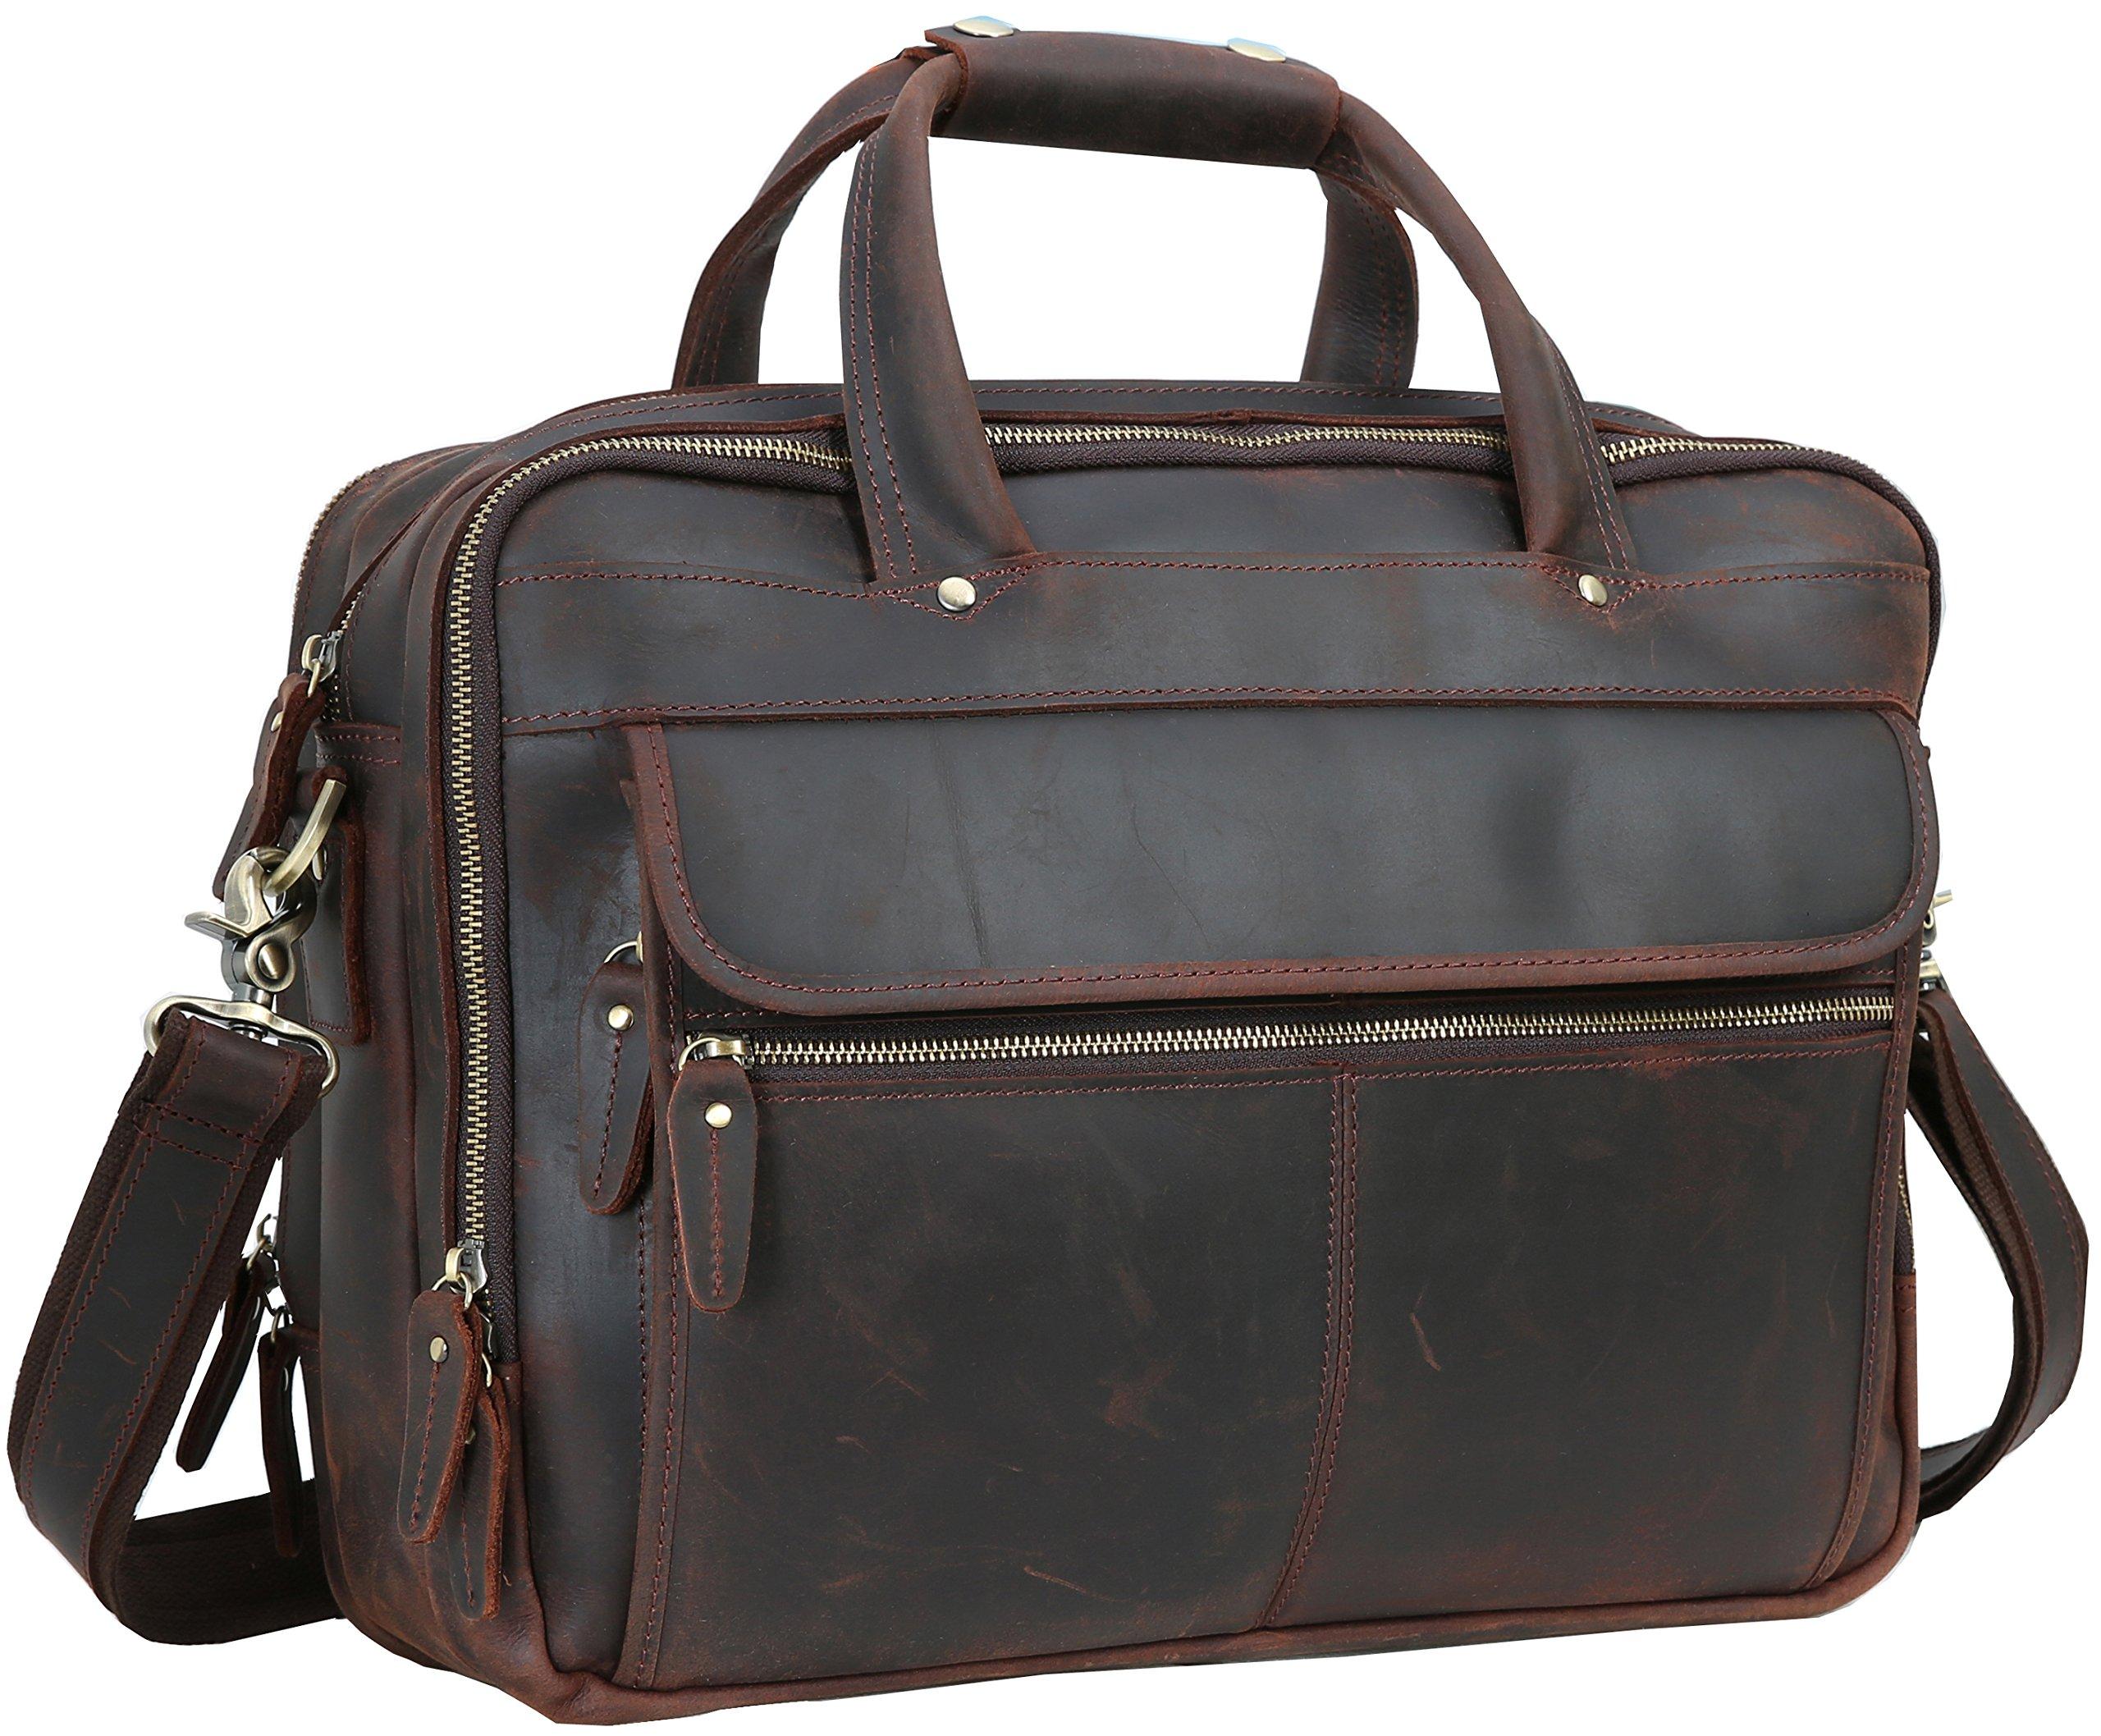 Iswee Men's Leather Vintage Style Messenger Bag Portfolio Briefcase Fit 2 Laptops Case 14'' 16'' Attach Case